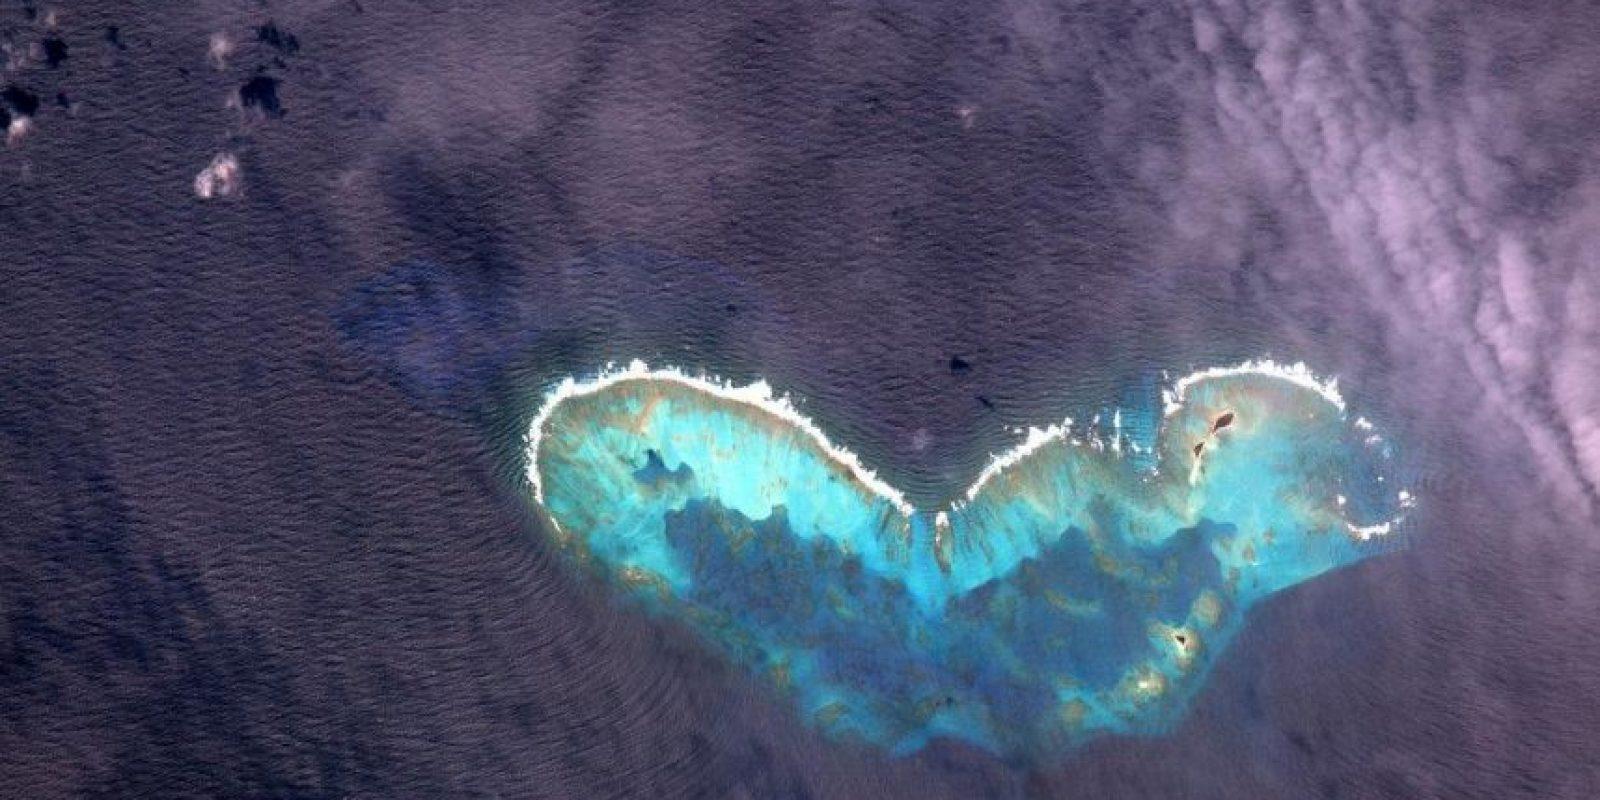 """Esta mariposa fue captada en el Golfo de México"". Foto:Facebook.com/pages/NASA-Astronaut-Scott-Kelly"